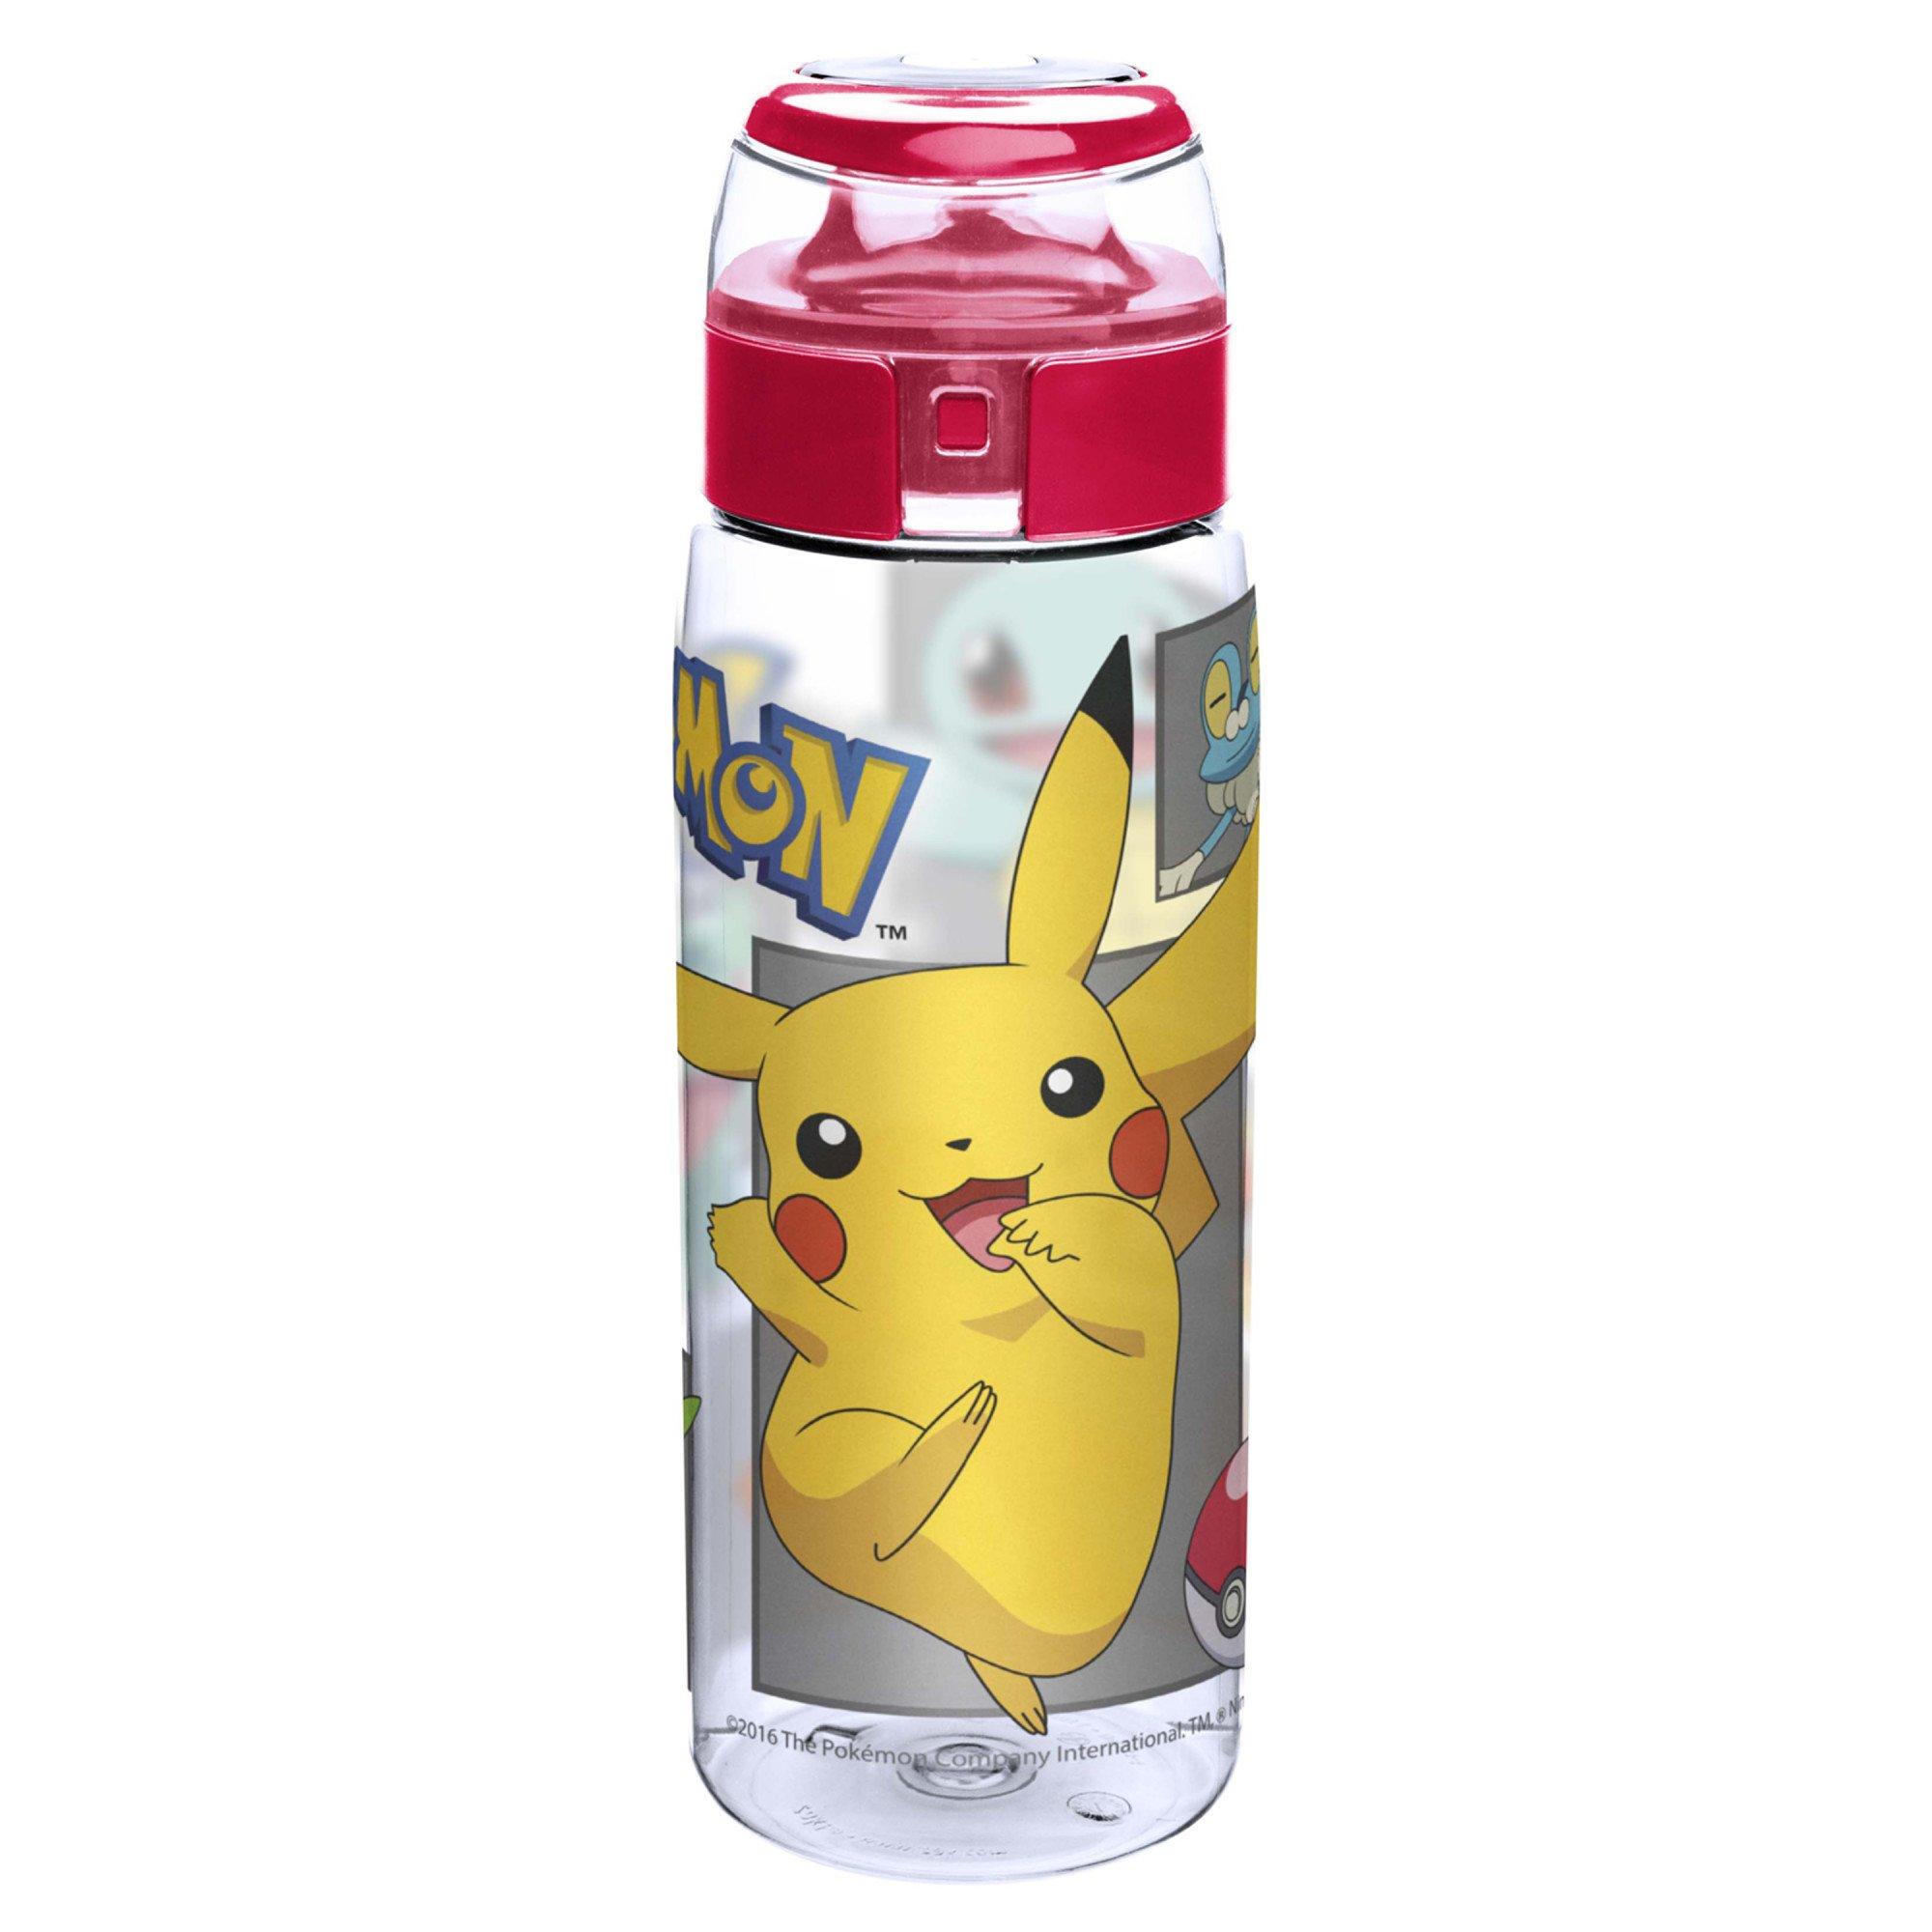 Pokemon POKC-K952 Pikachu Water Bottles 25 oz. by Zak Designs by Pokémon (Image #1)